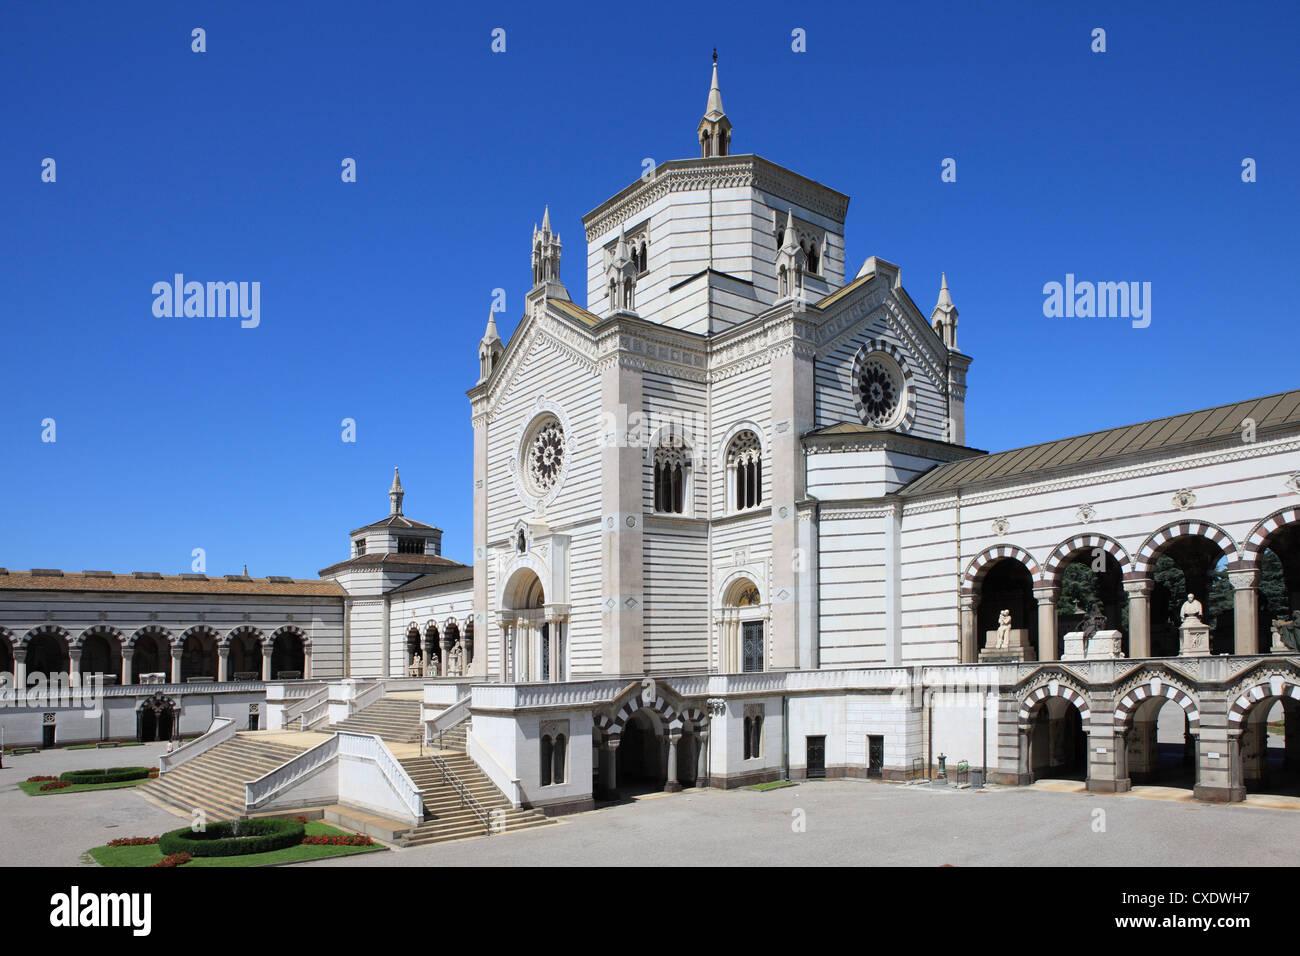 Monumental Cemetery by Architect Carlo Maciachini, Milan, Lombardy, Italy, Europe - Stock Image